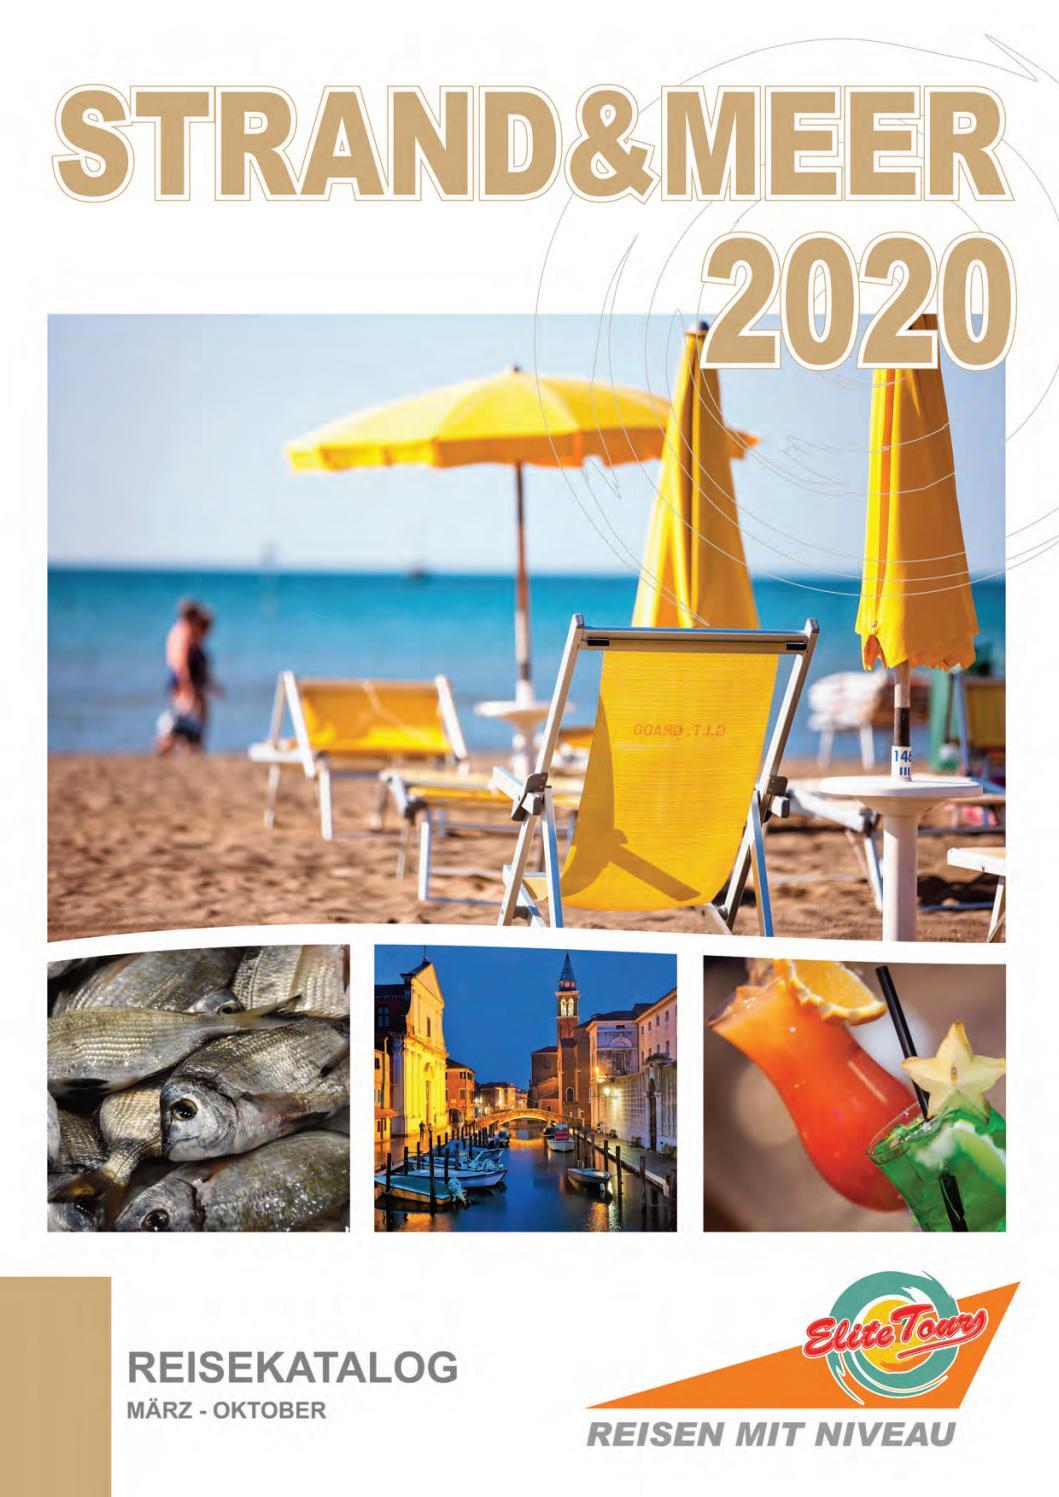 strand und meer 2020elite tours reisebüro  issuu